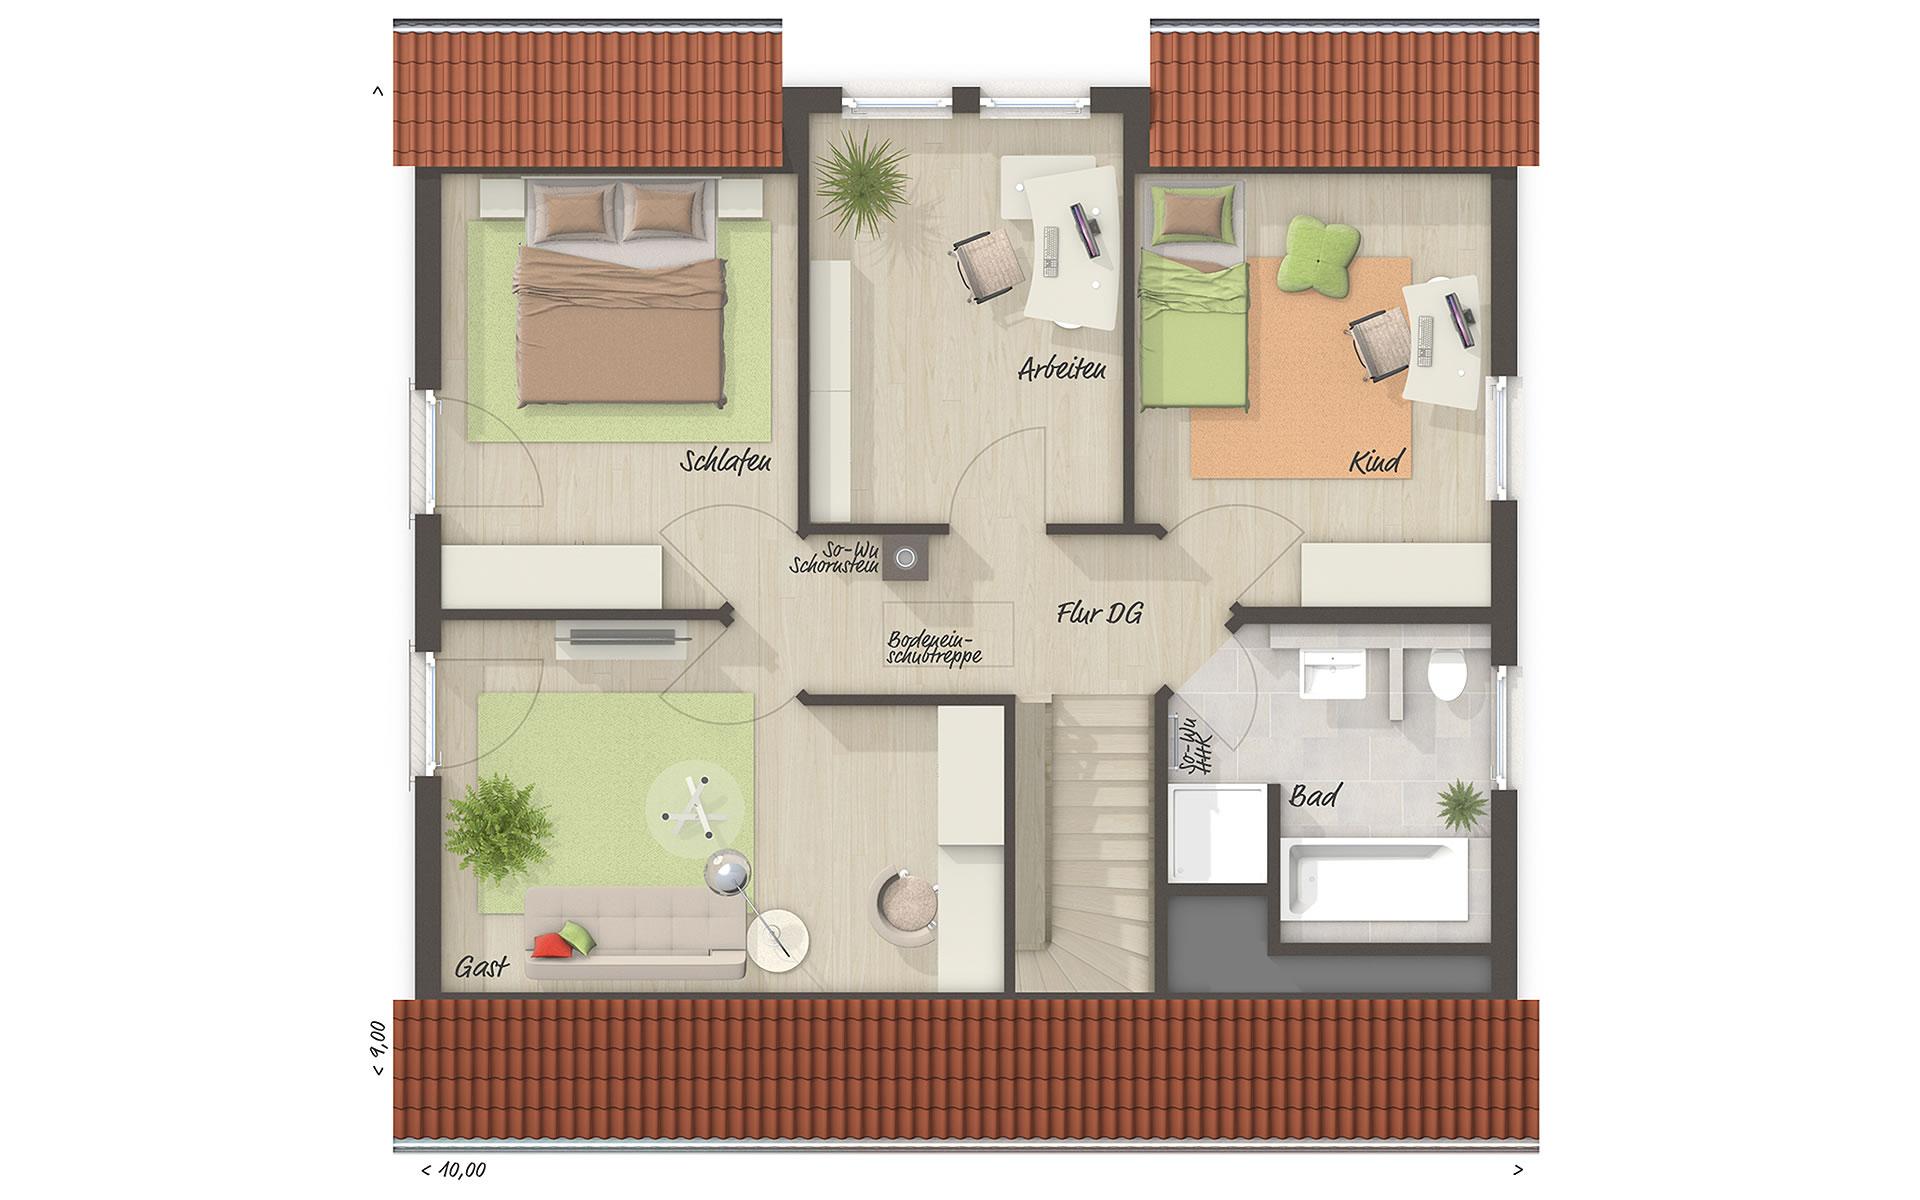 Dachgeschoss Flair 134 von Town & Country Haus Lizenzgeber GmbH